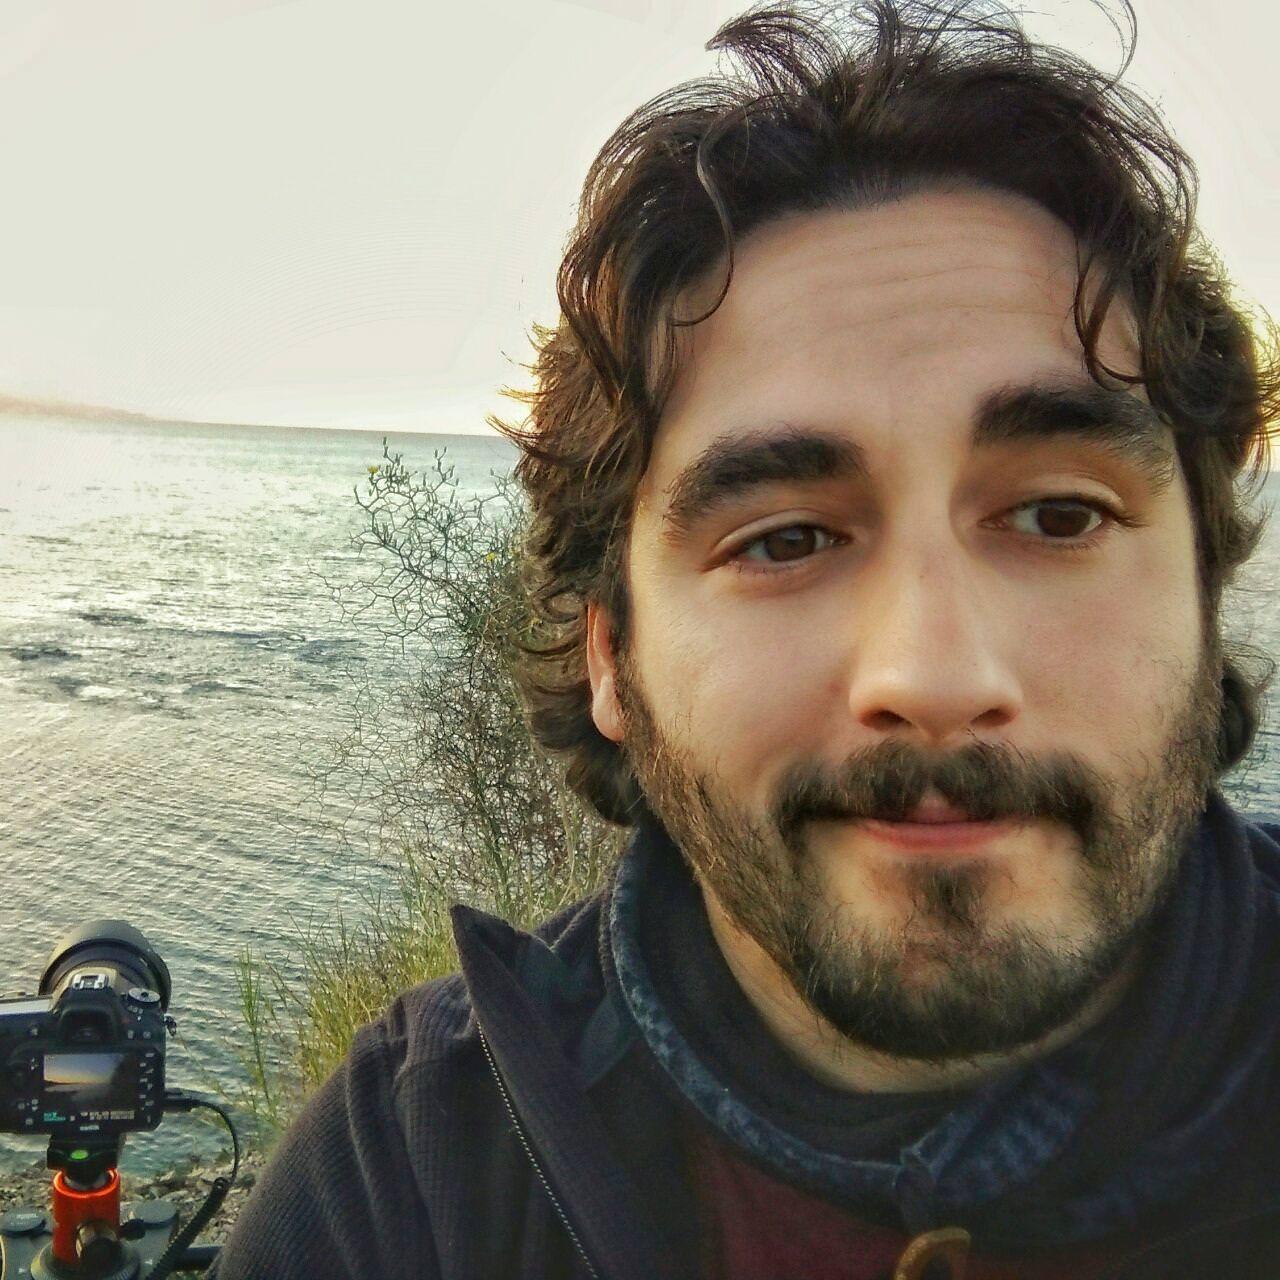 Pablo Cáceres - Fotógrafo de confianza de Google Street View